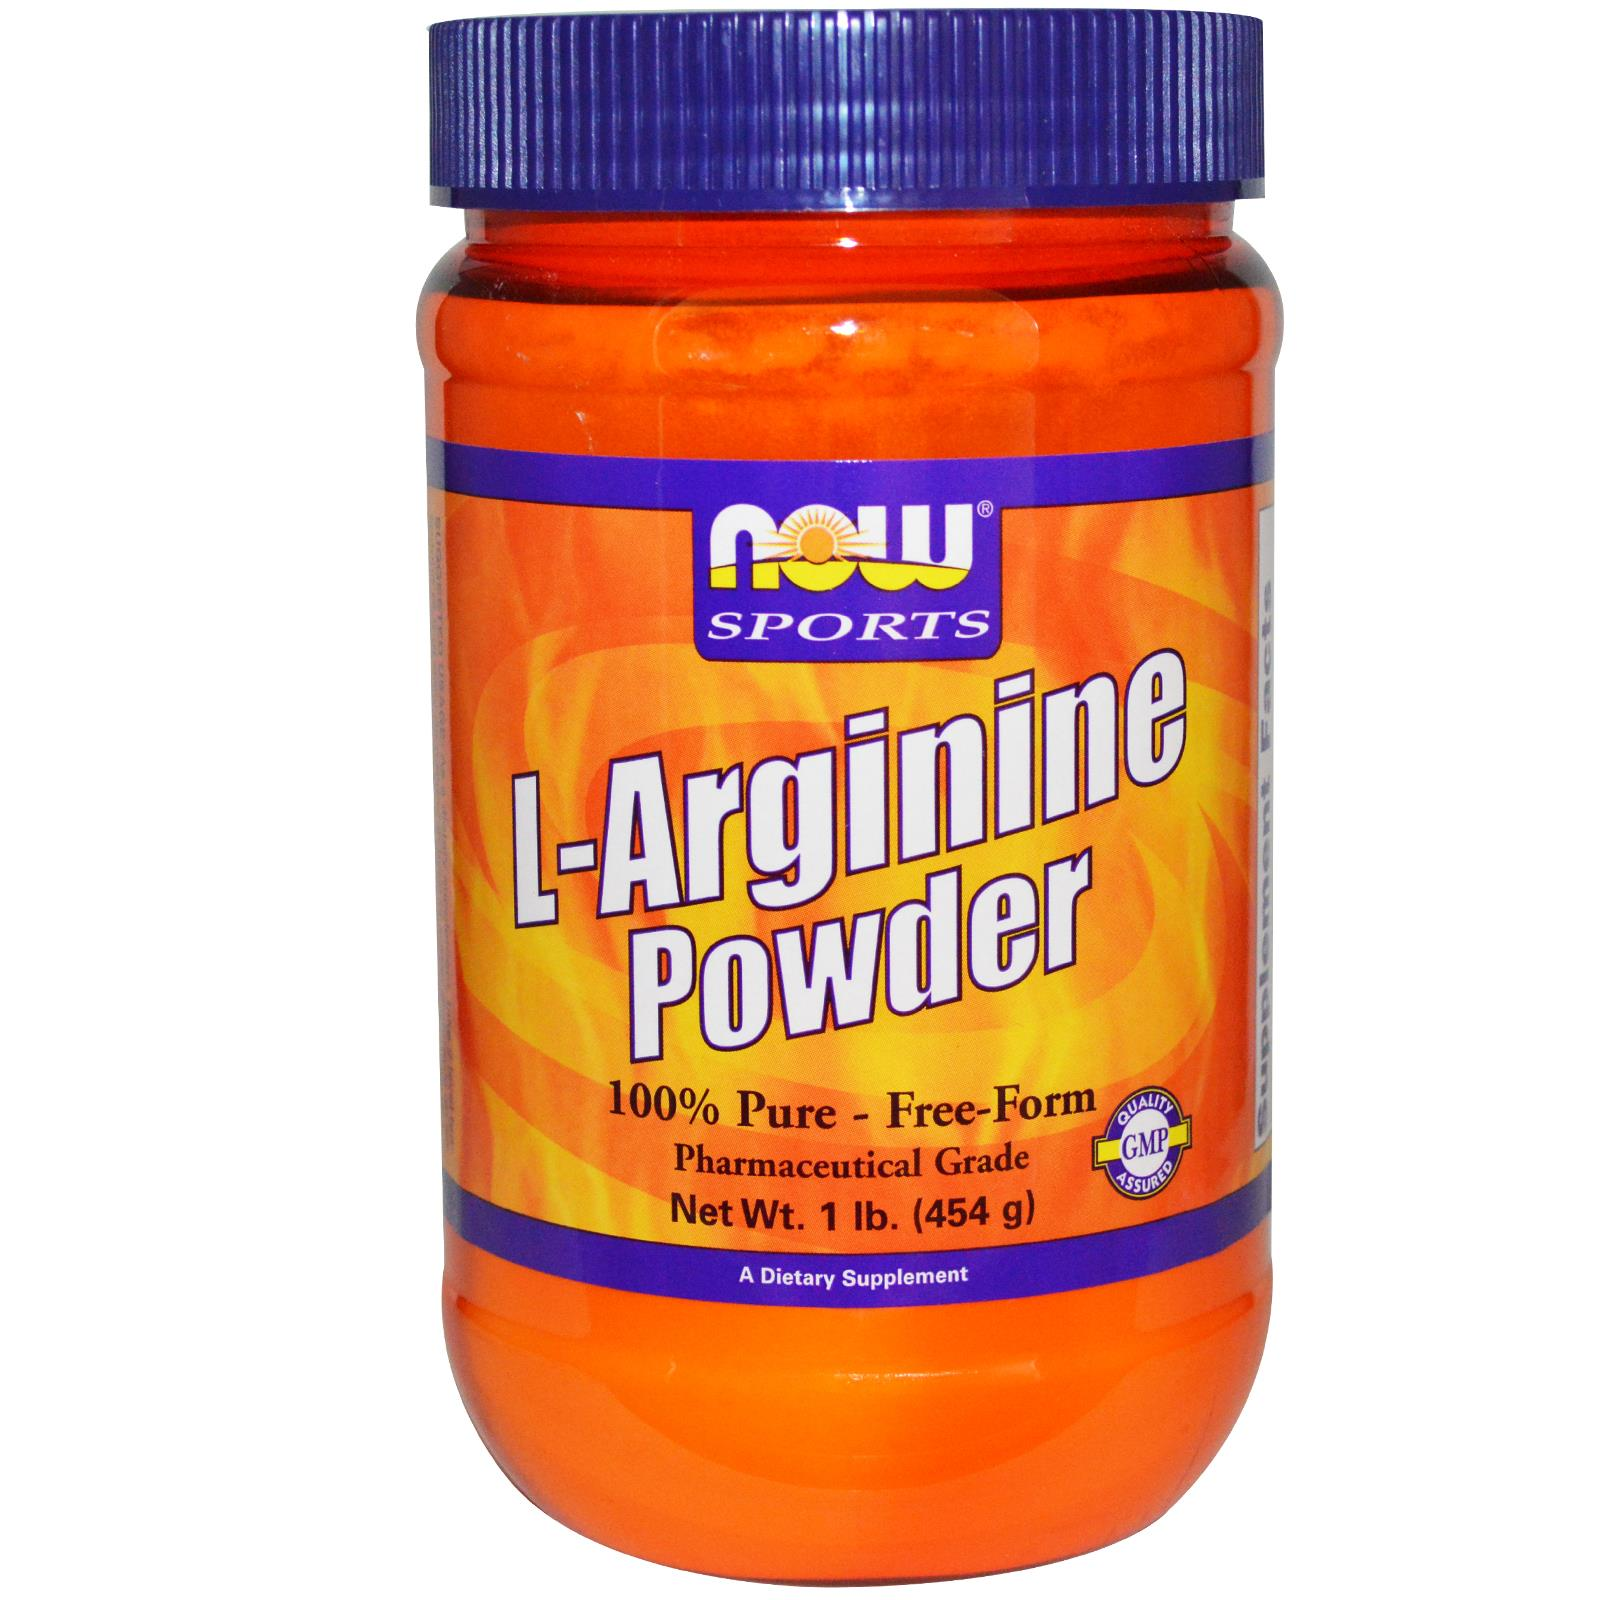 NOW Sport Nutrition L-Arginine Powder - описание и состав